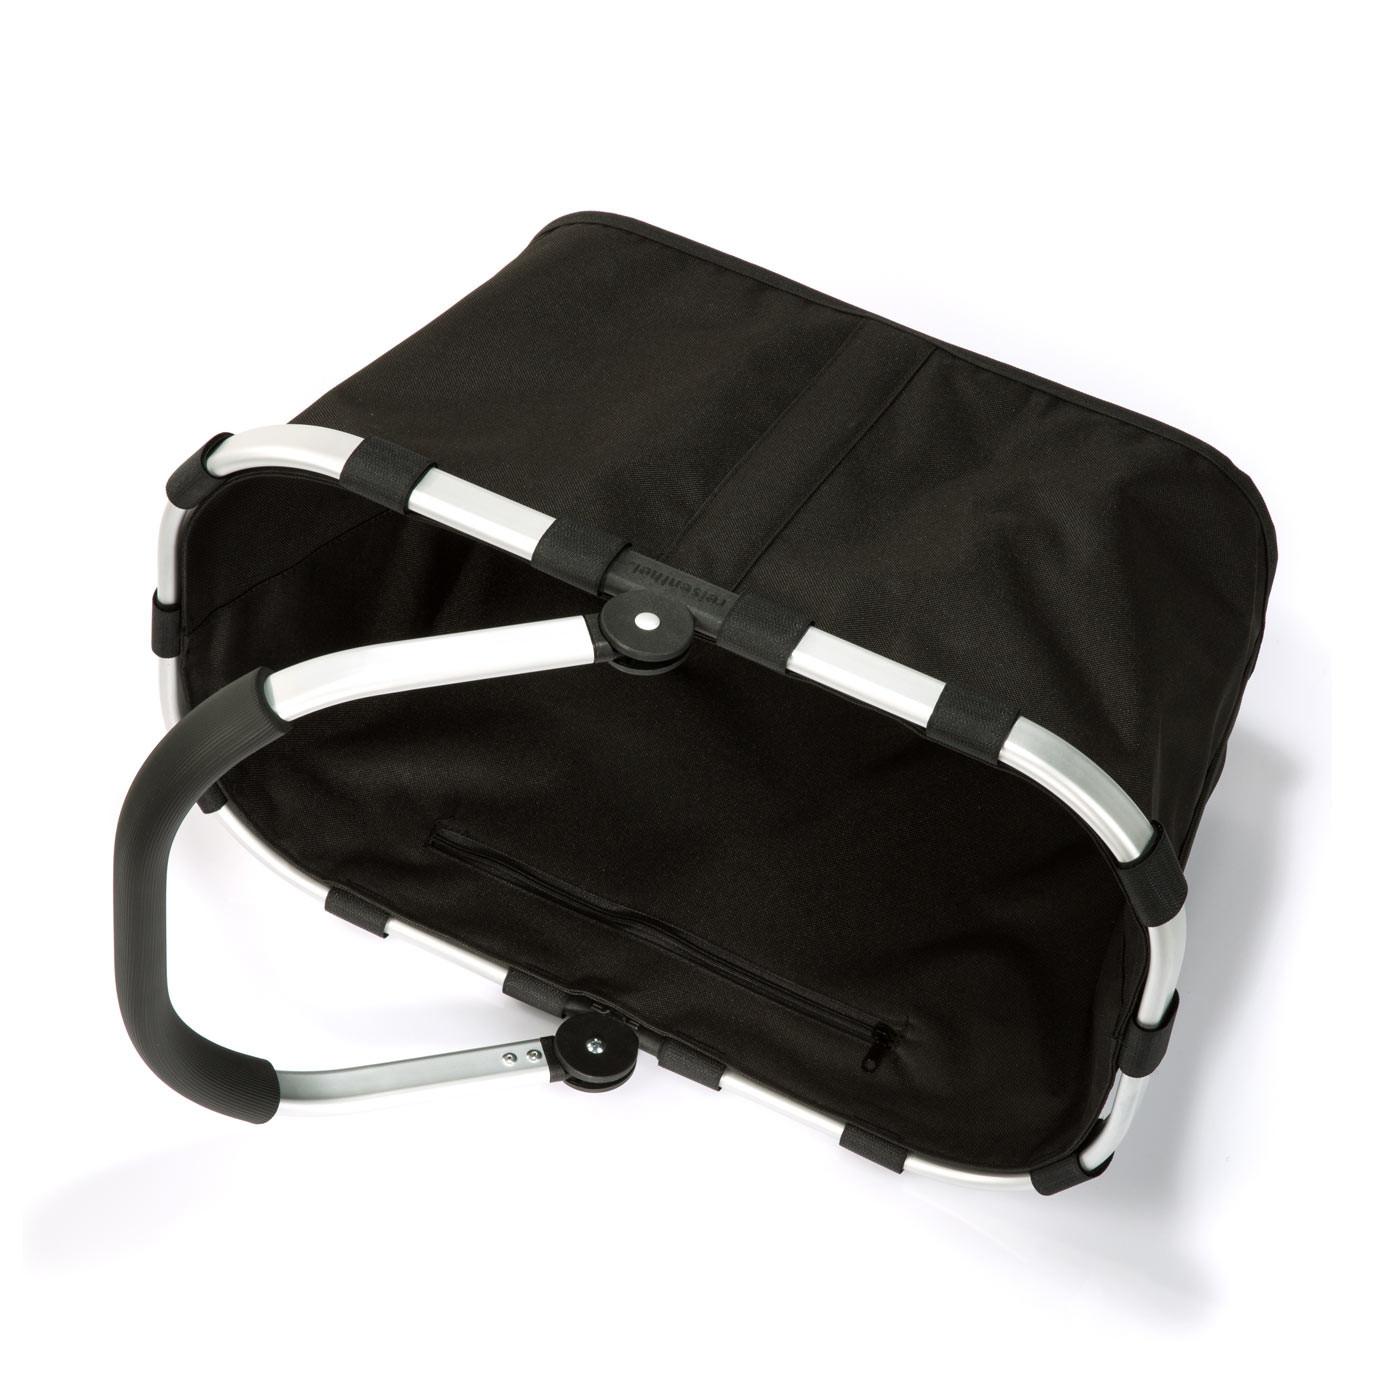 Reisenthel Carrybag black im Suhl Online Shop